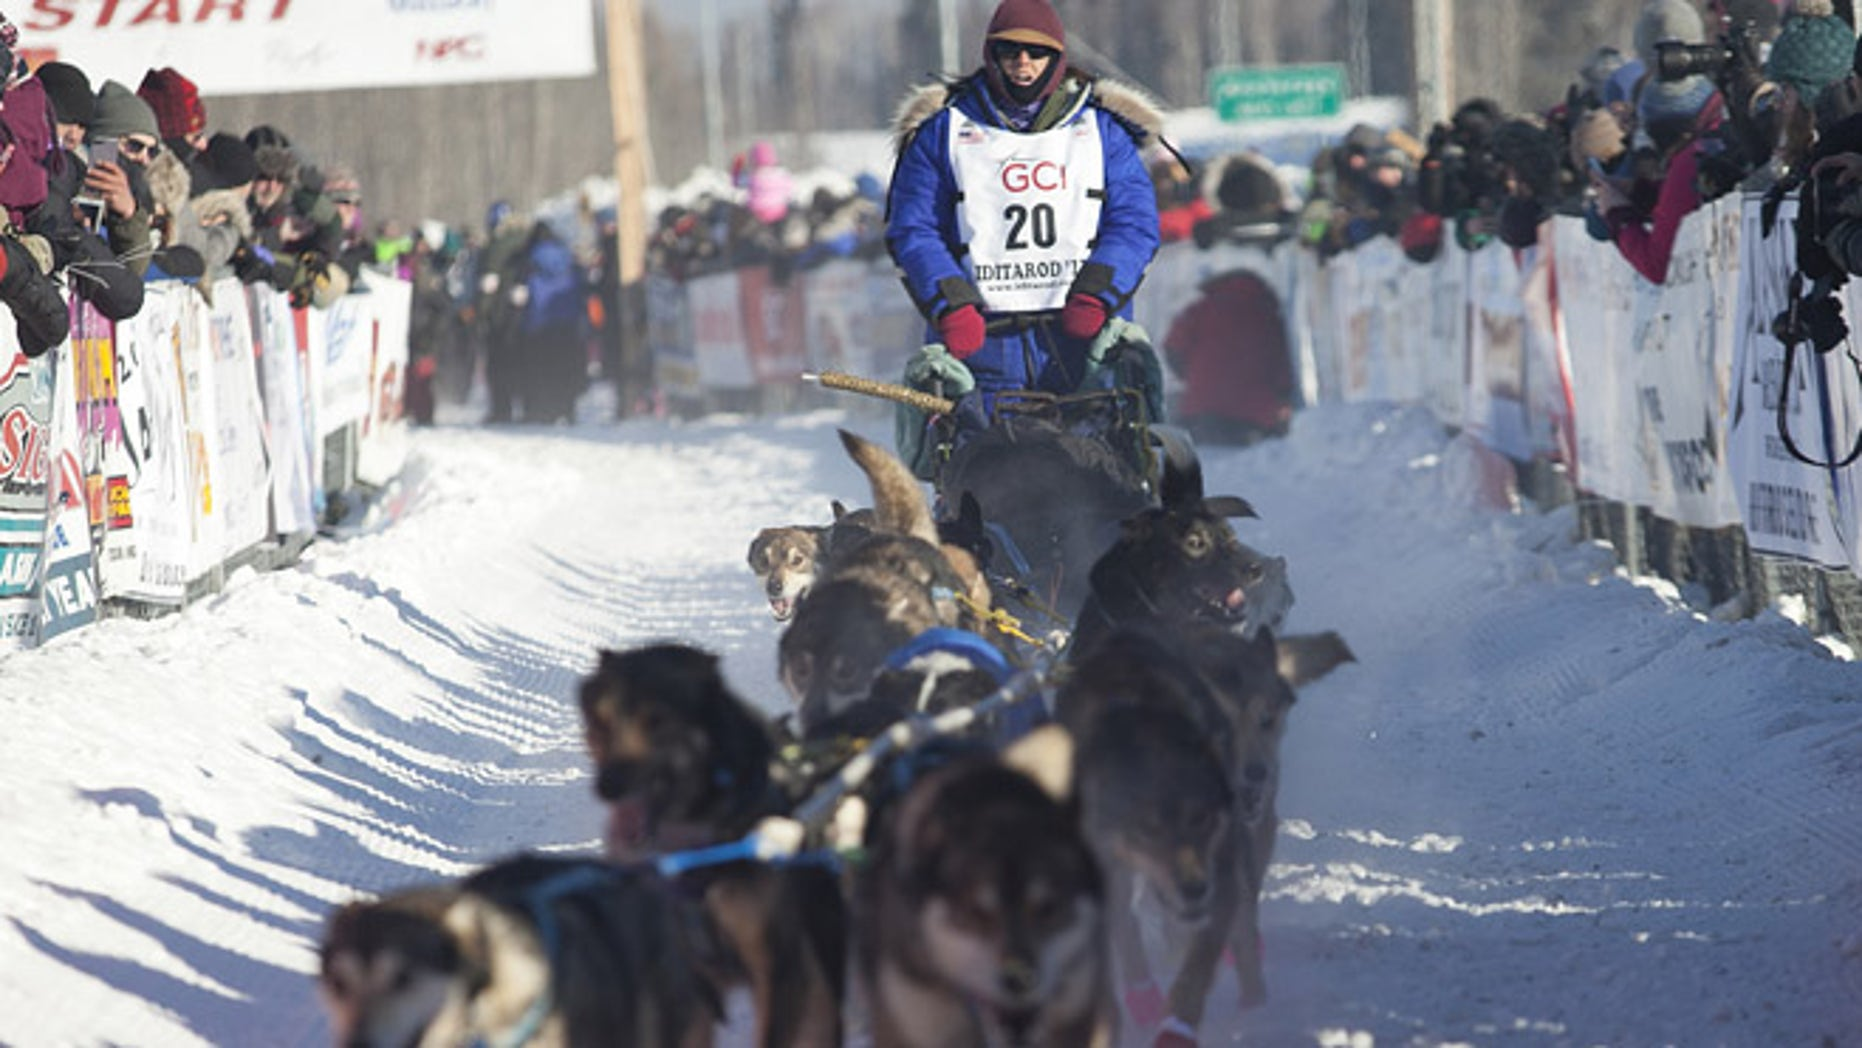 Karin Hendrickson, bib #20, at the start of the 45th Iditarod Trail Sled Dog Race in Fairbanks, Alaska, this week.